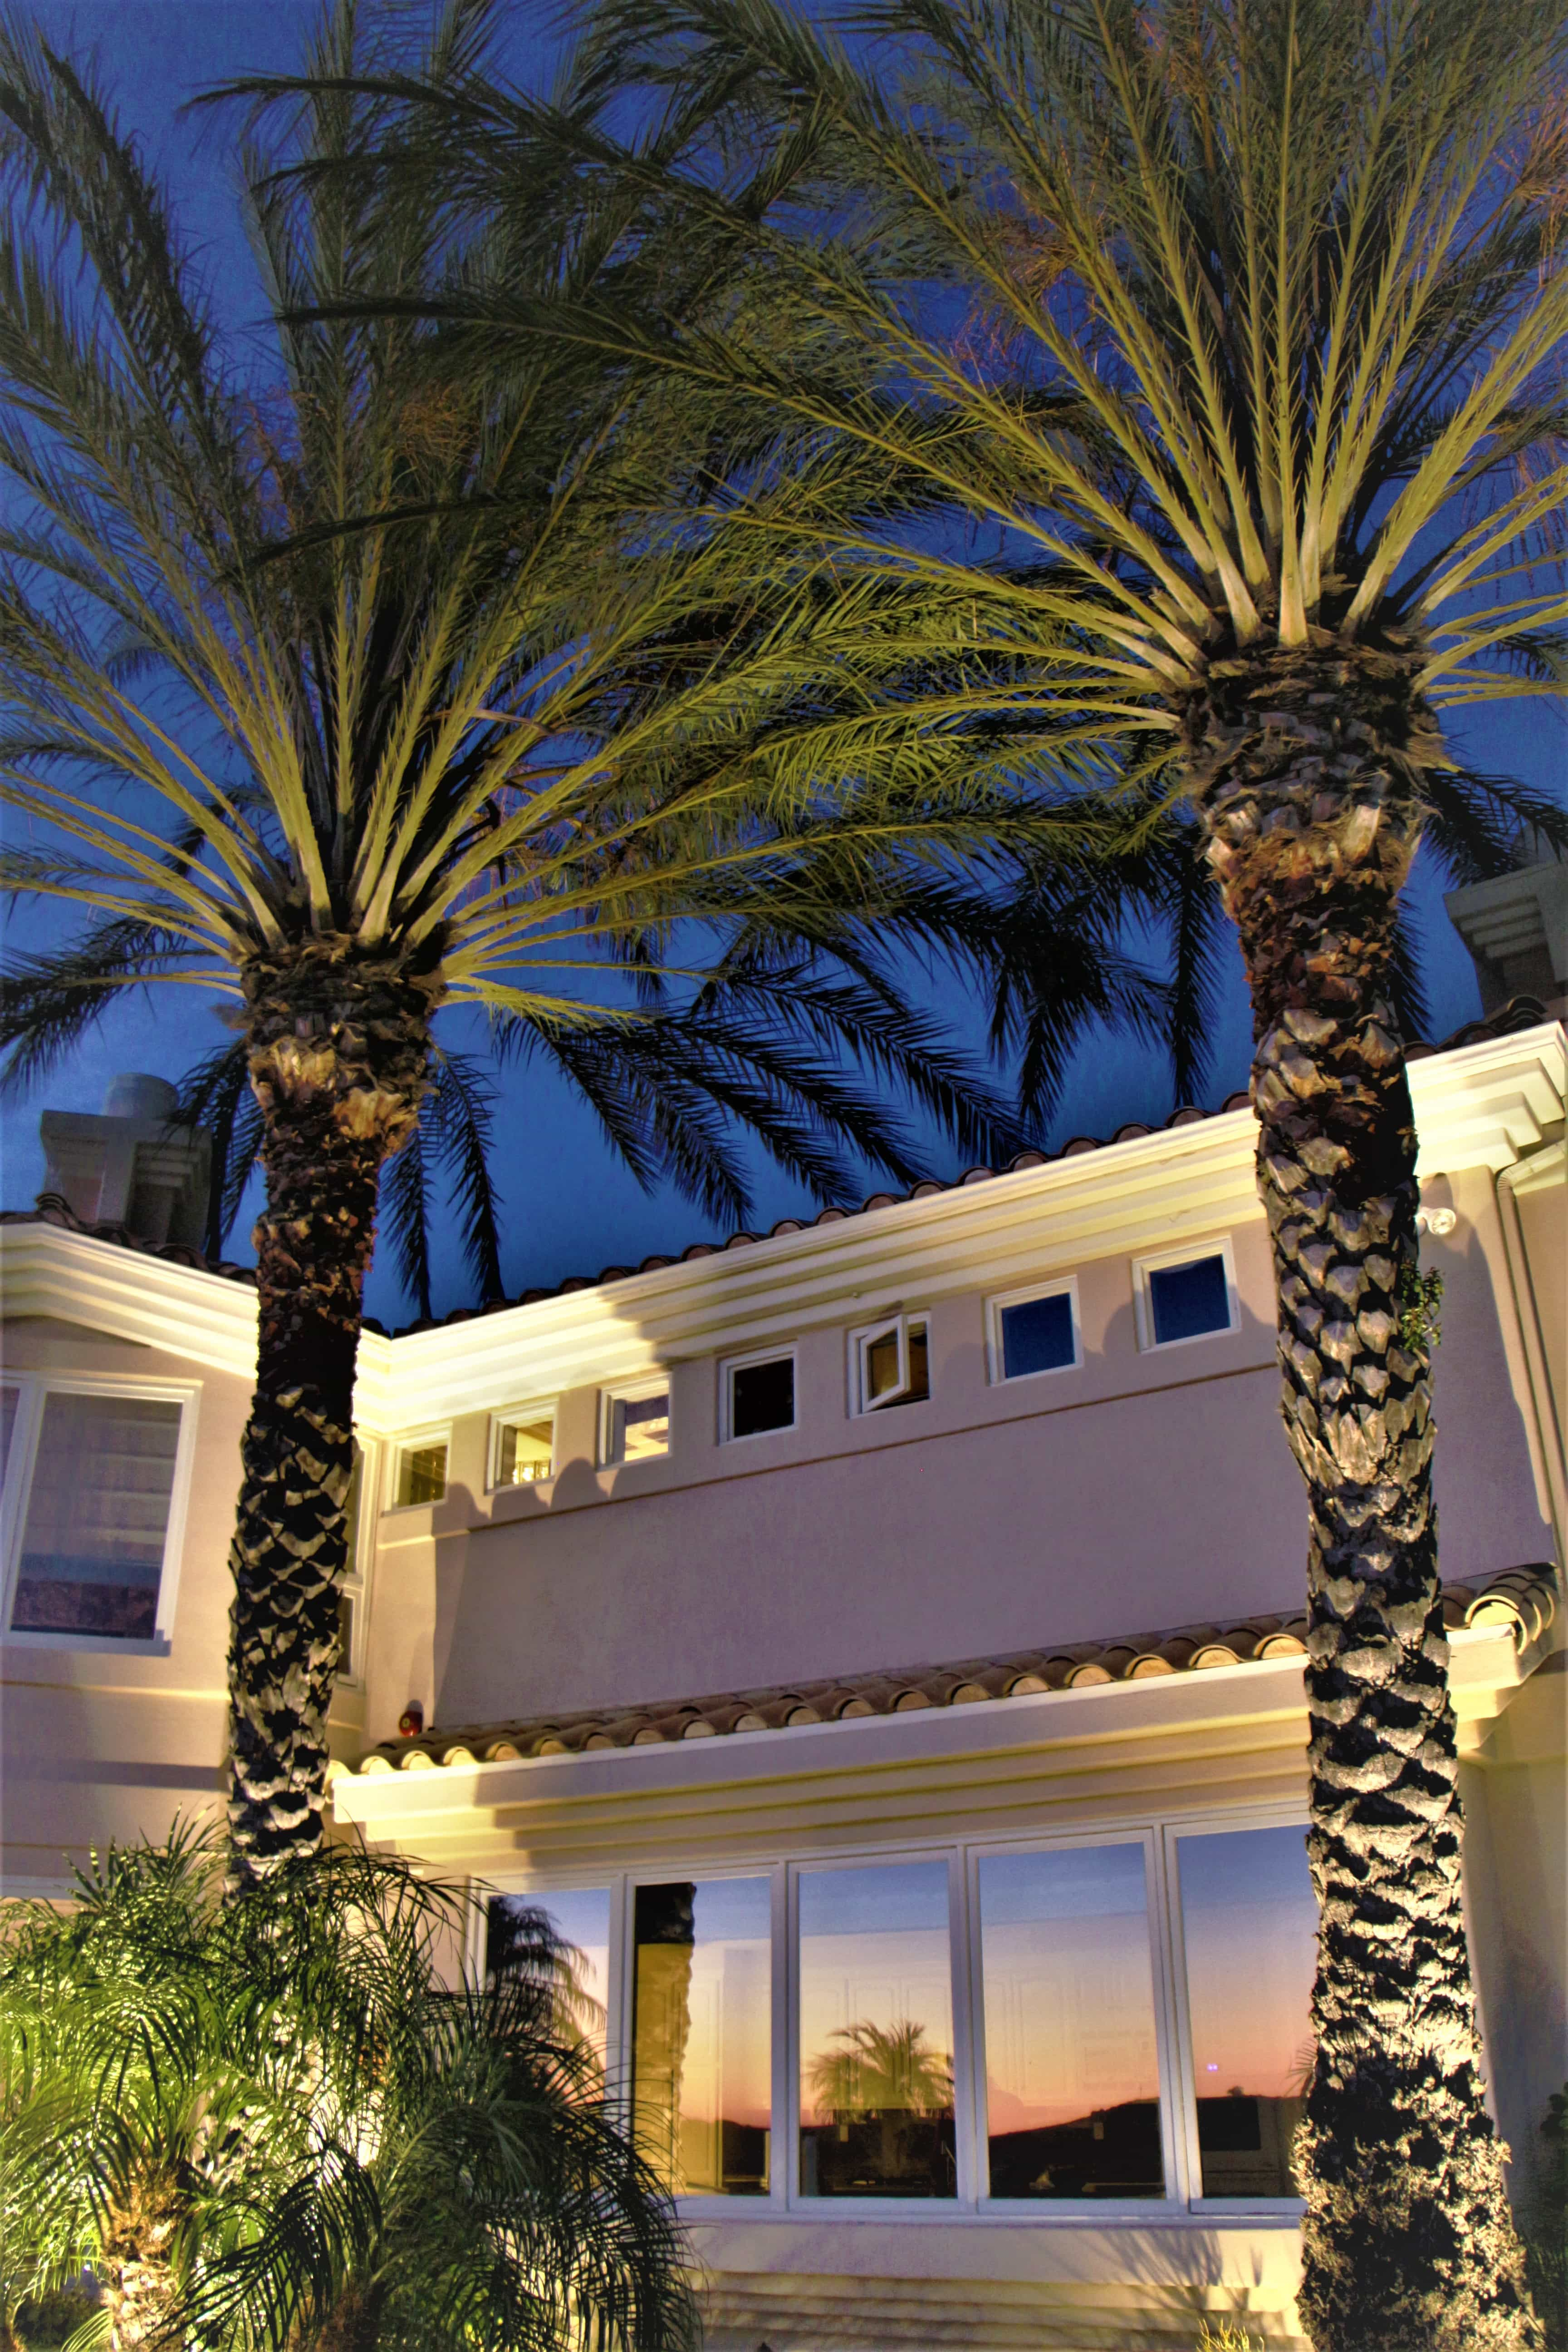 San Clemente Home gets Outdoor Landscape Lighting Installation 1